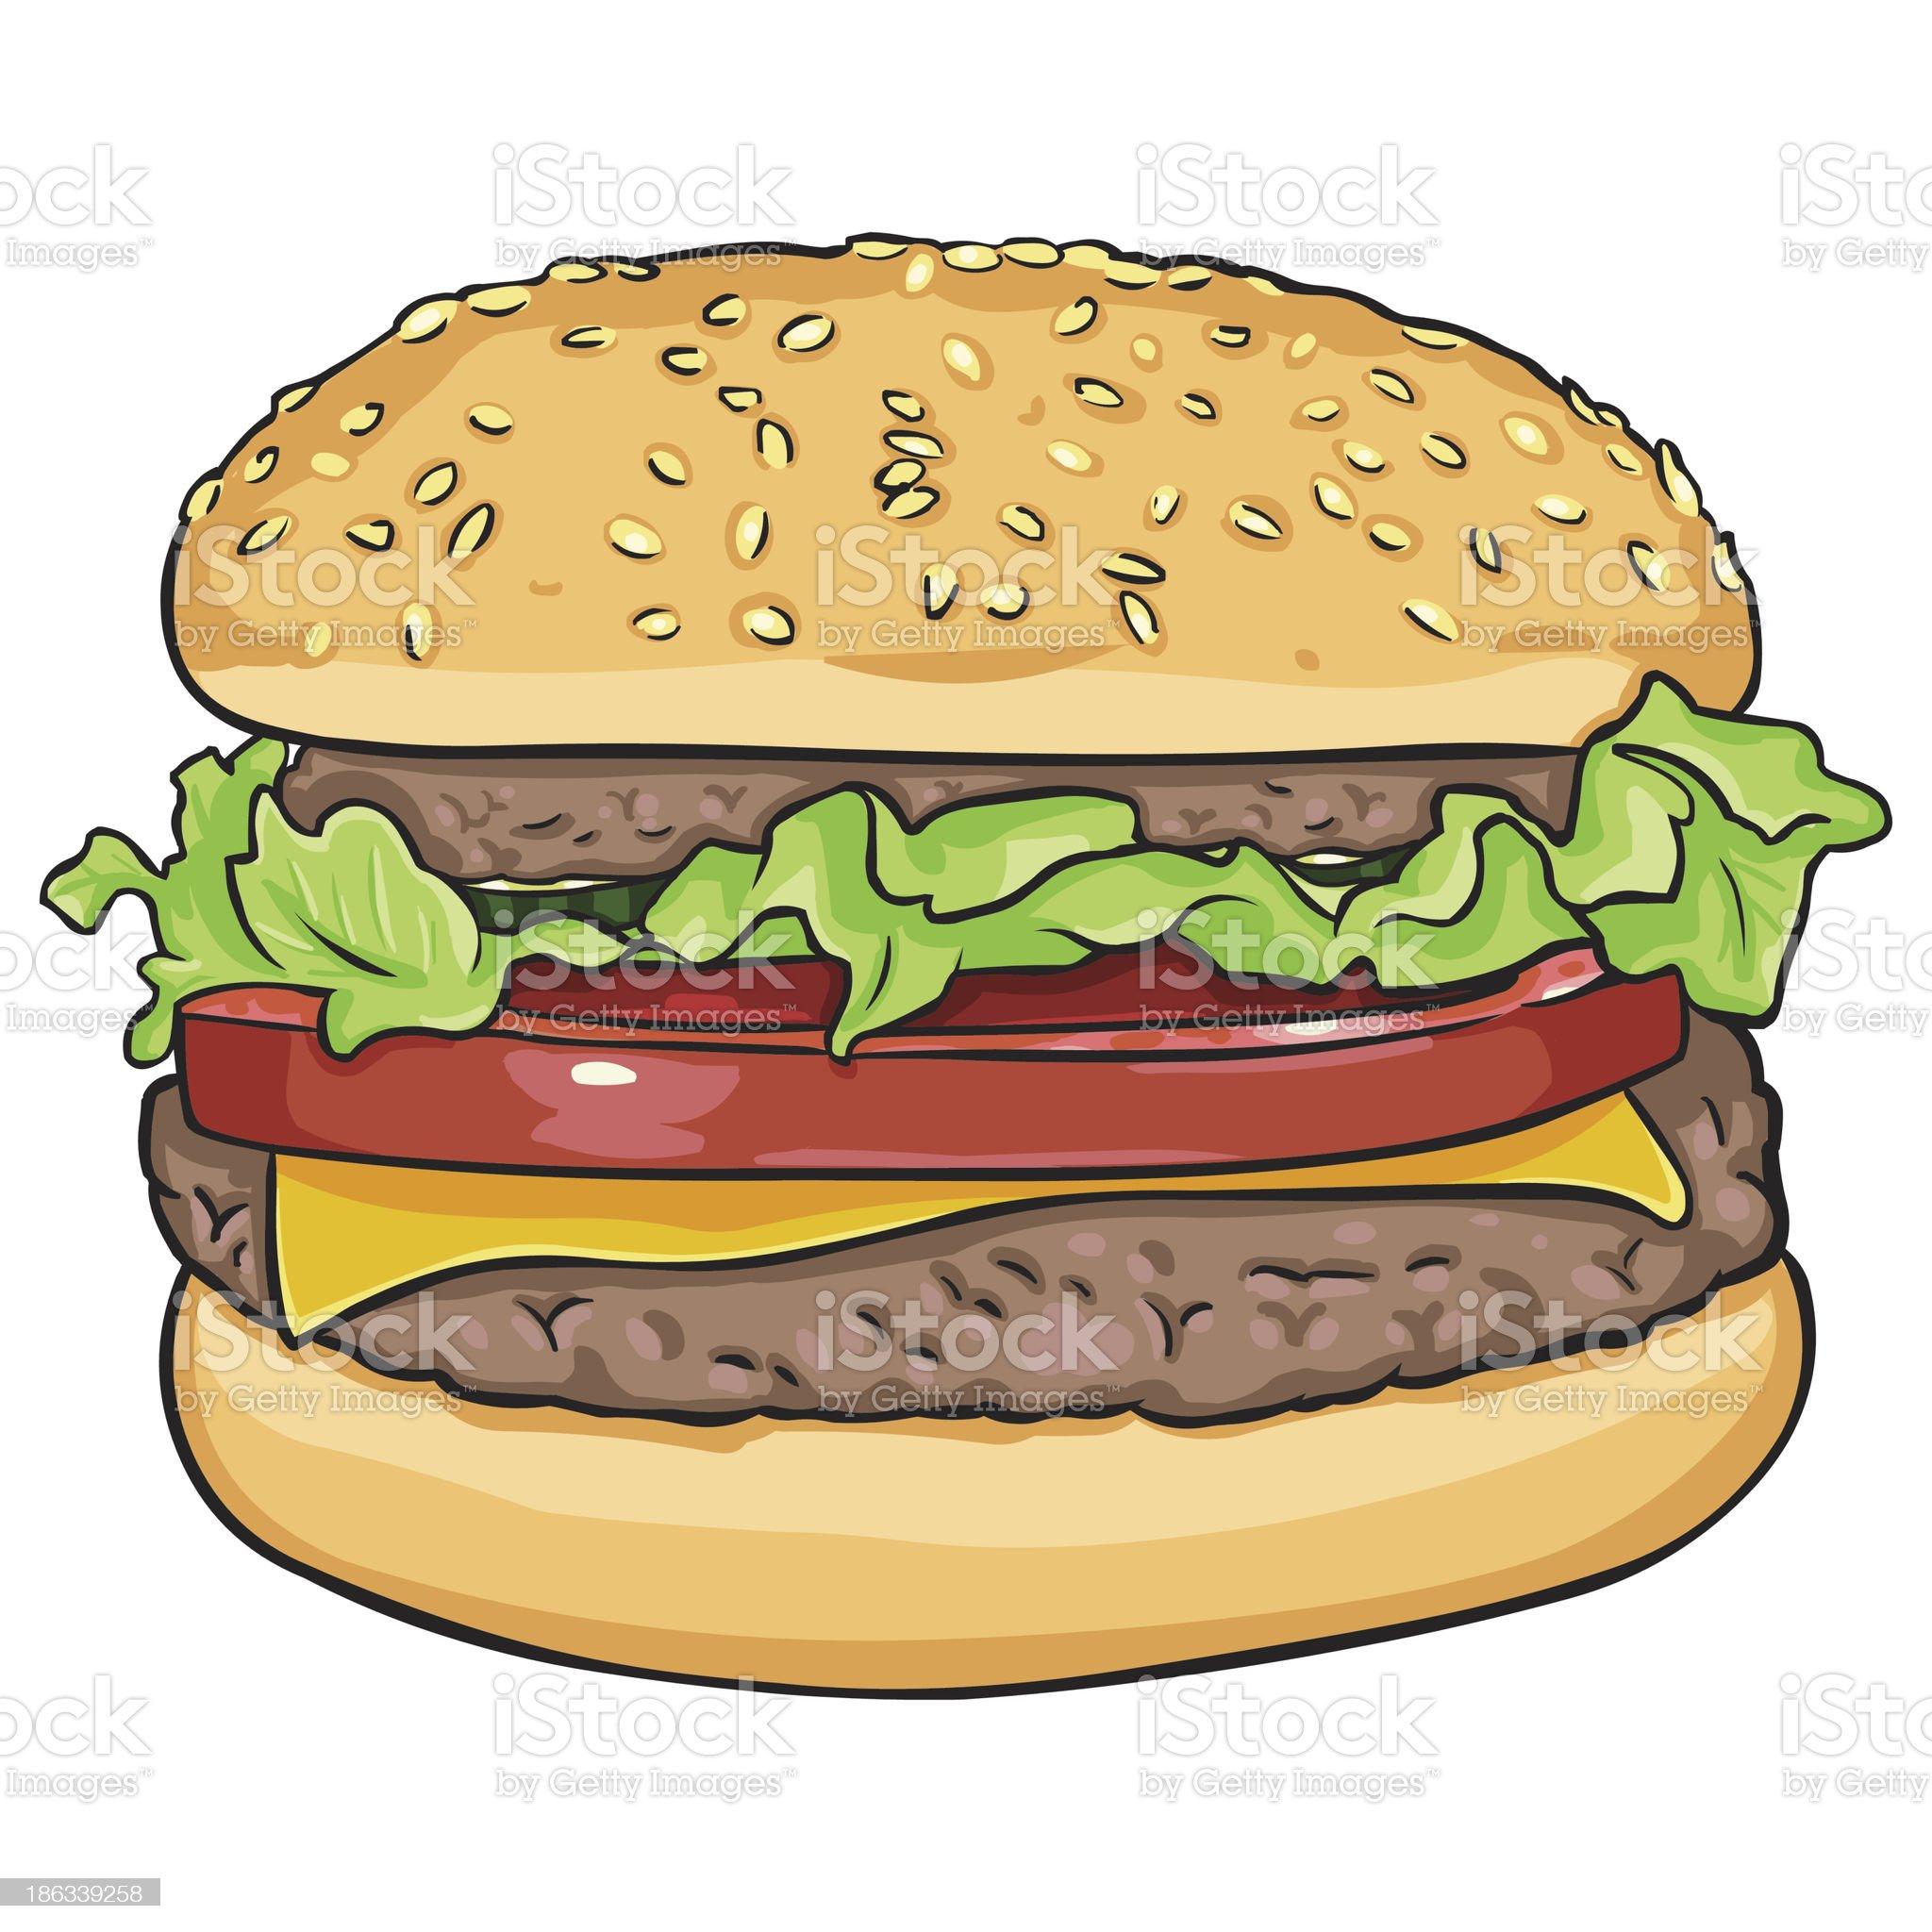 vector cartoon hamburger royalty-free stock vector art